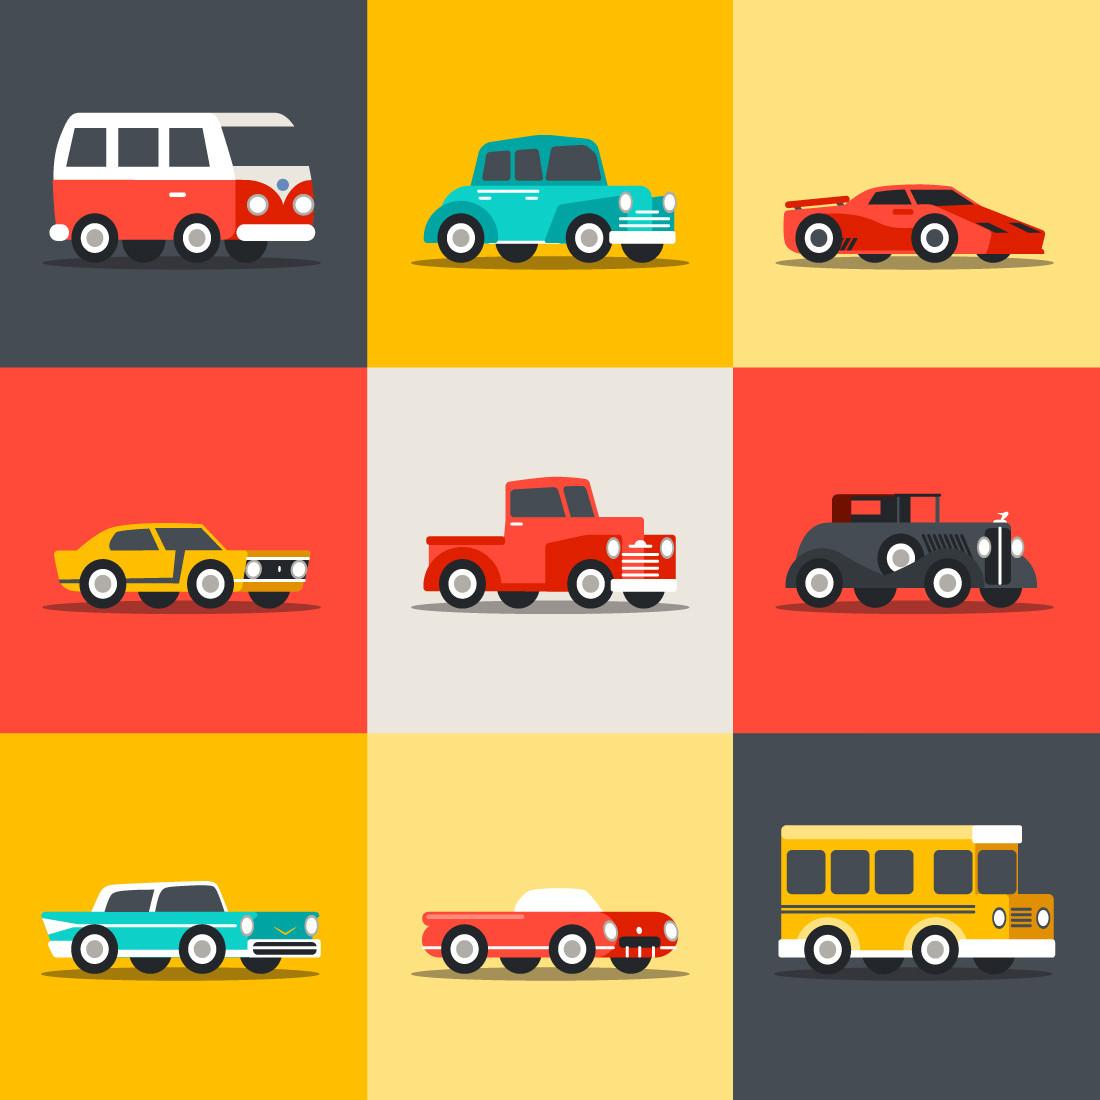 Papel De Parede Infantil Quadriculado Colorido Carros Vintage